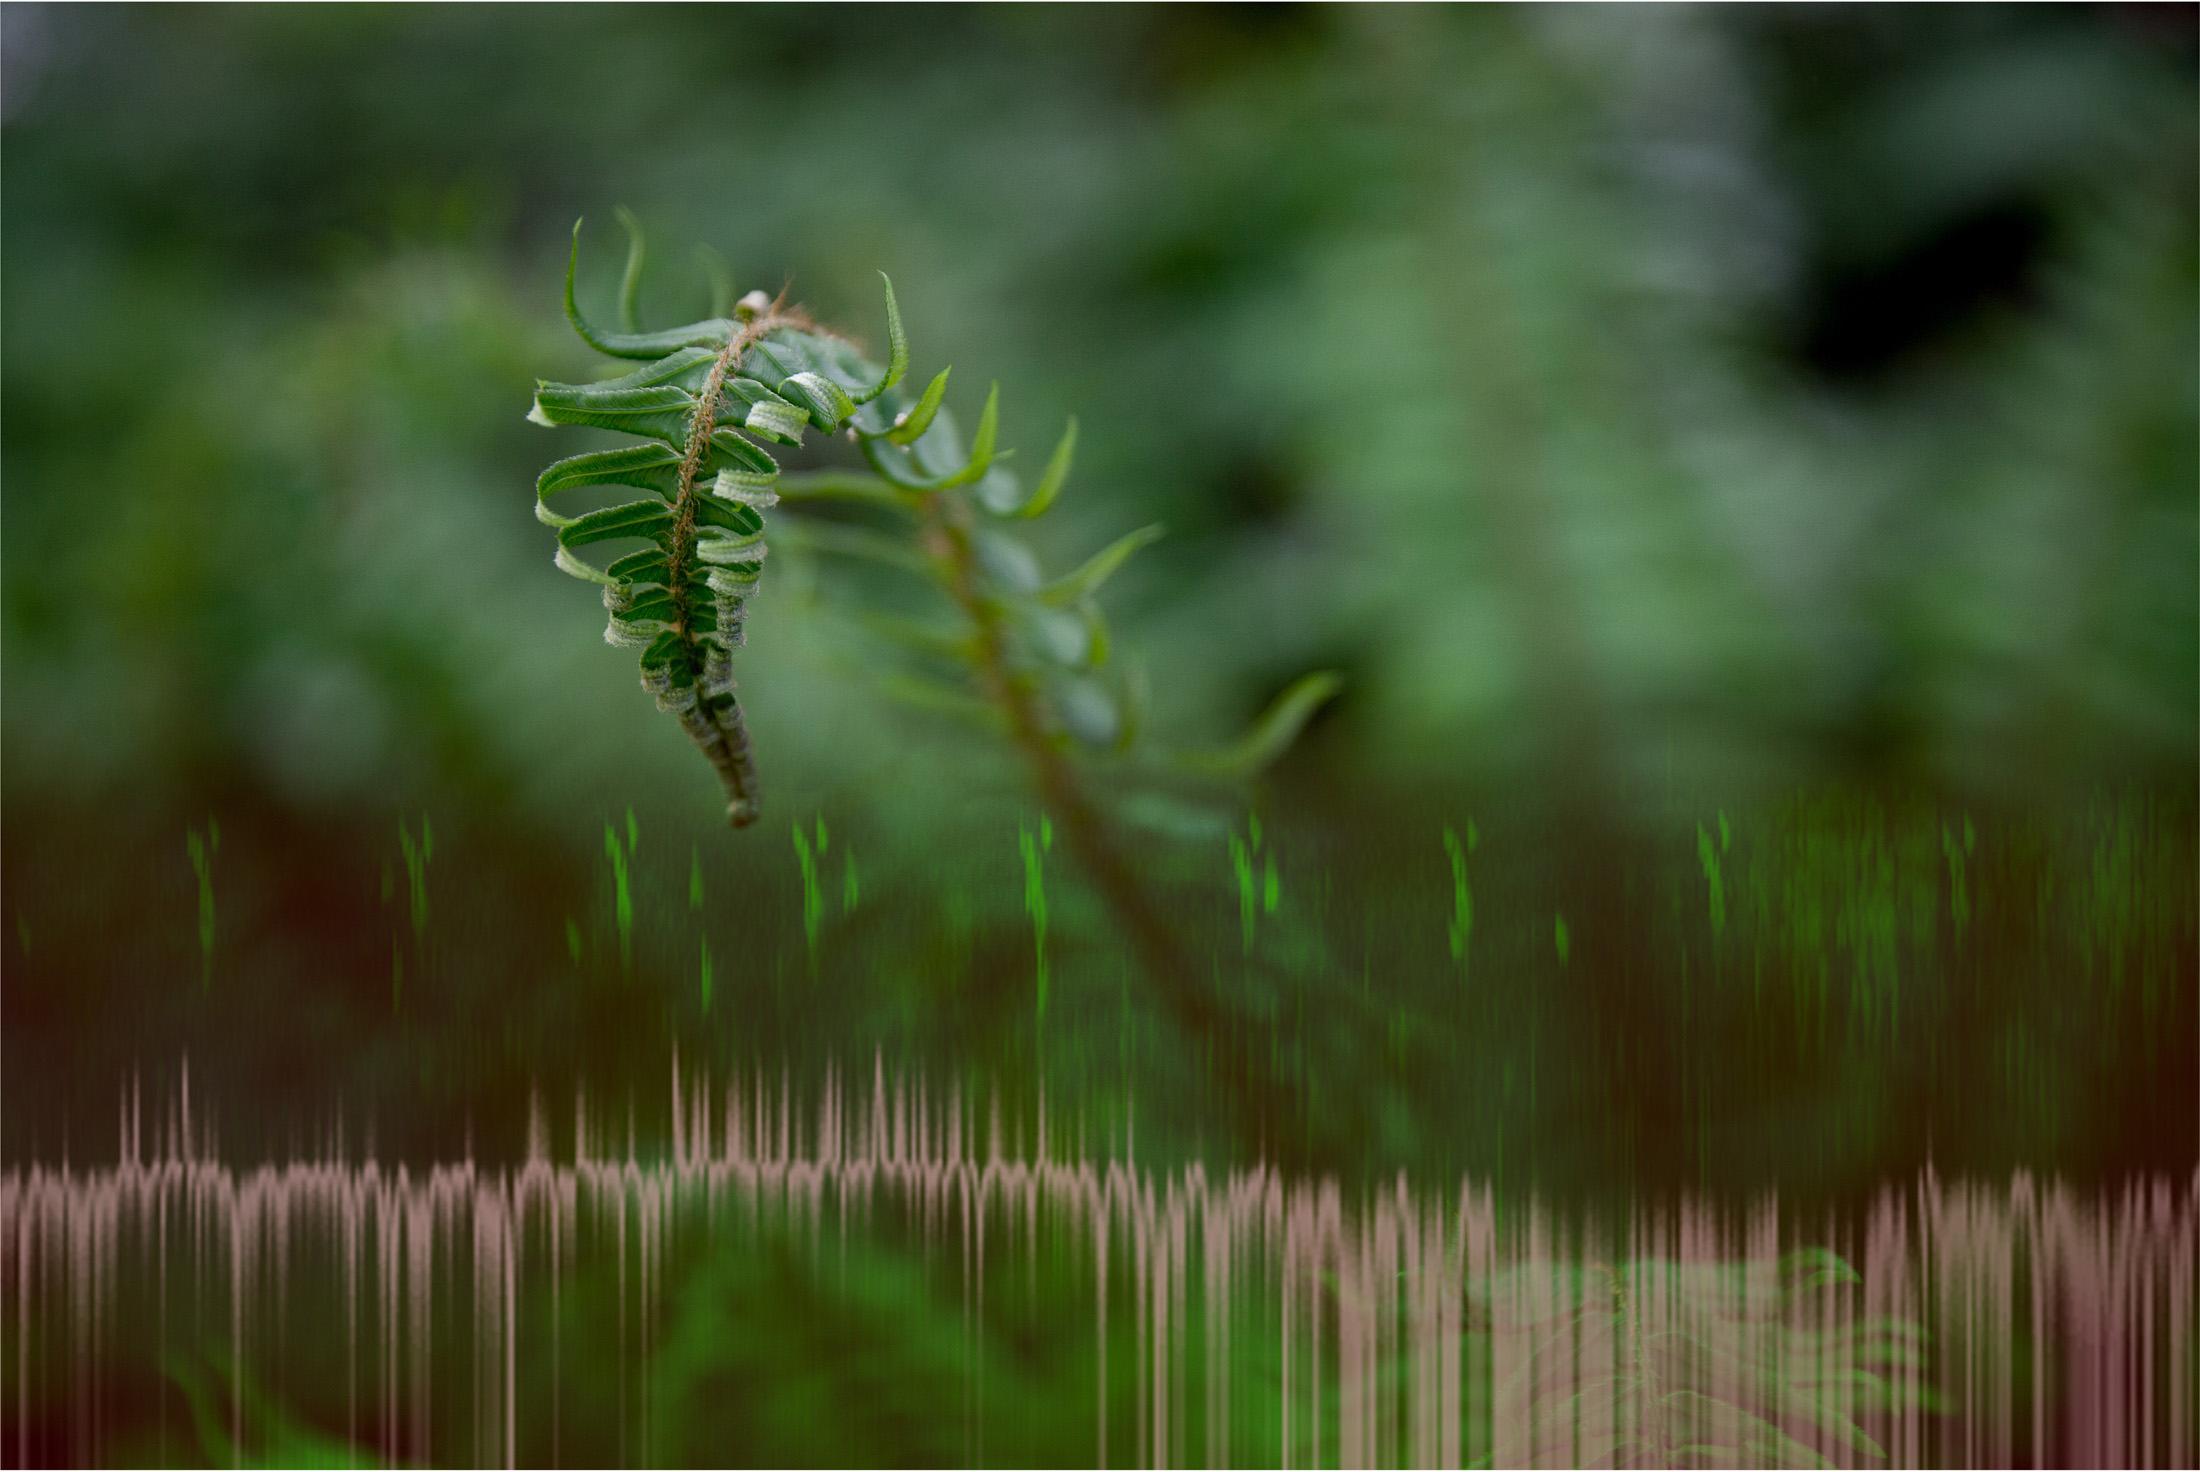 fern, birdsong, passing train